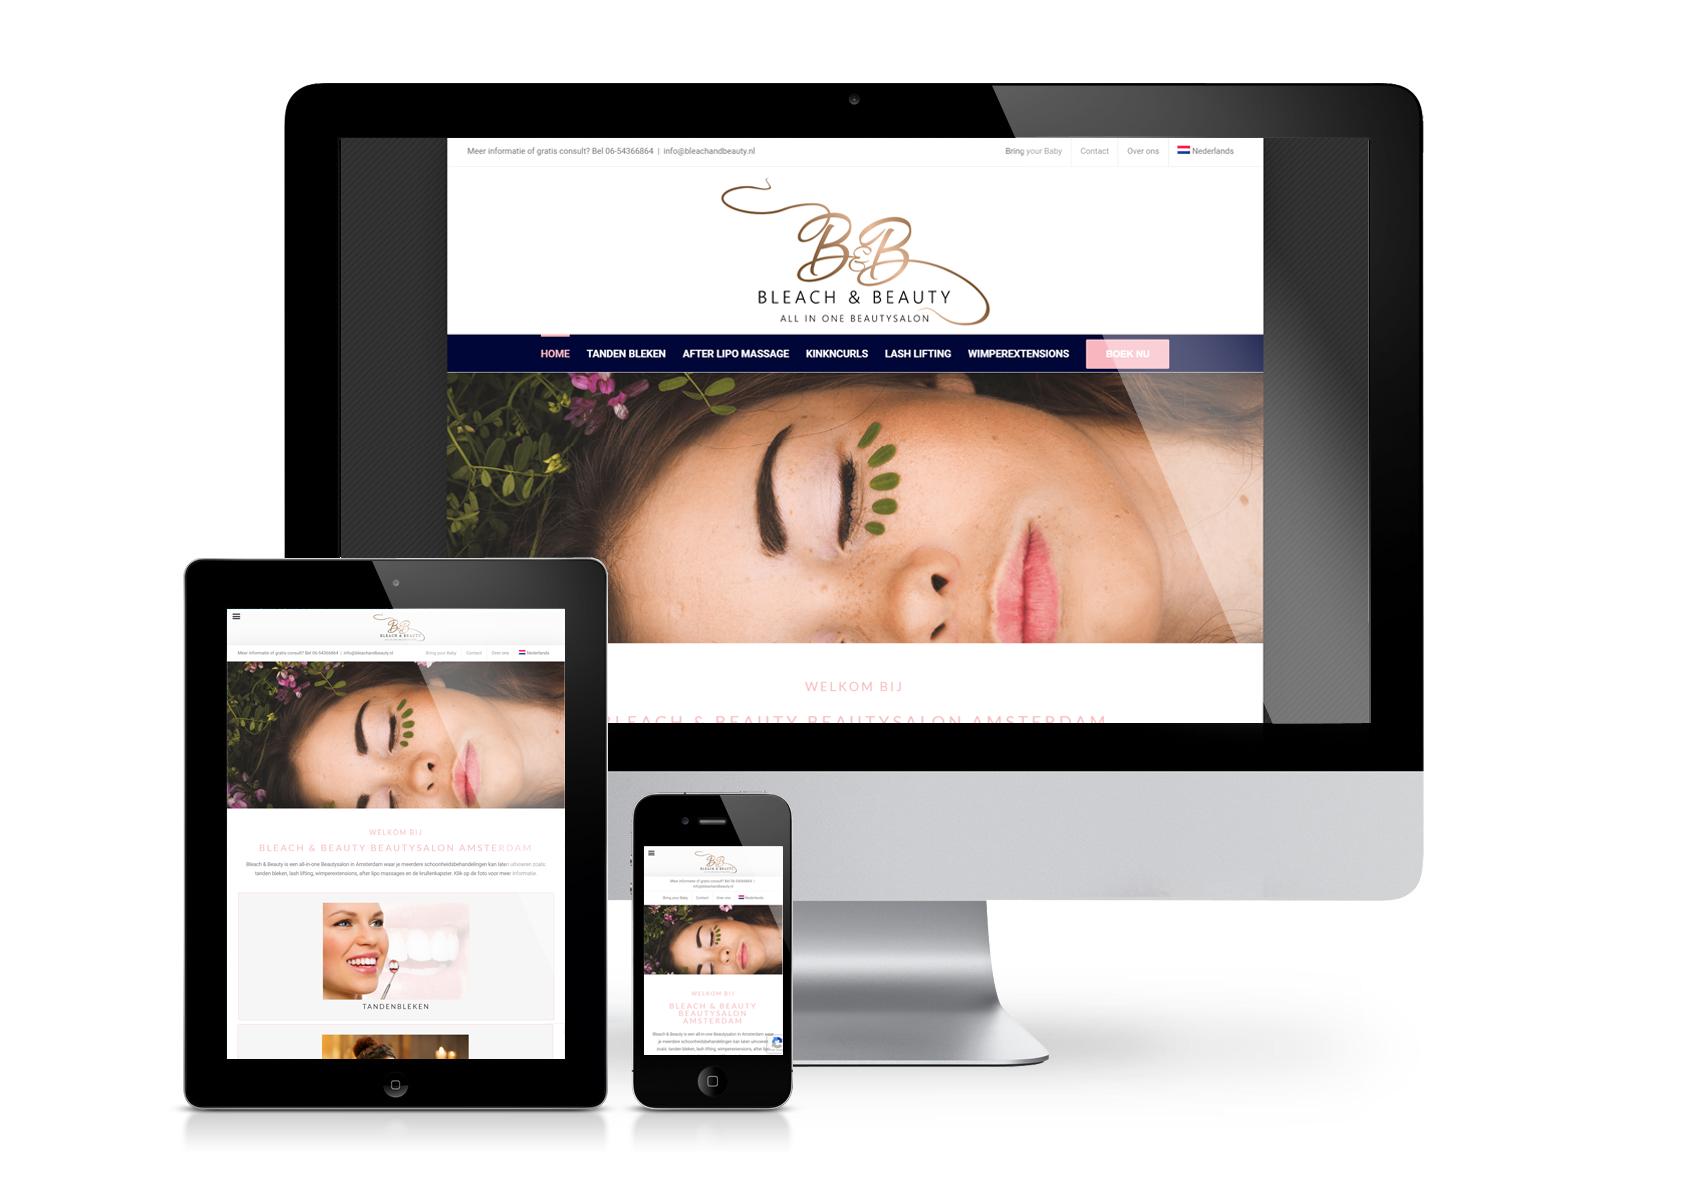 Rickid_webdesign_portfolio_bleachandbeauty